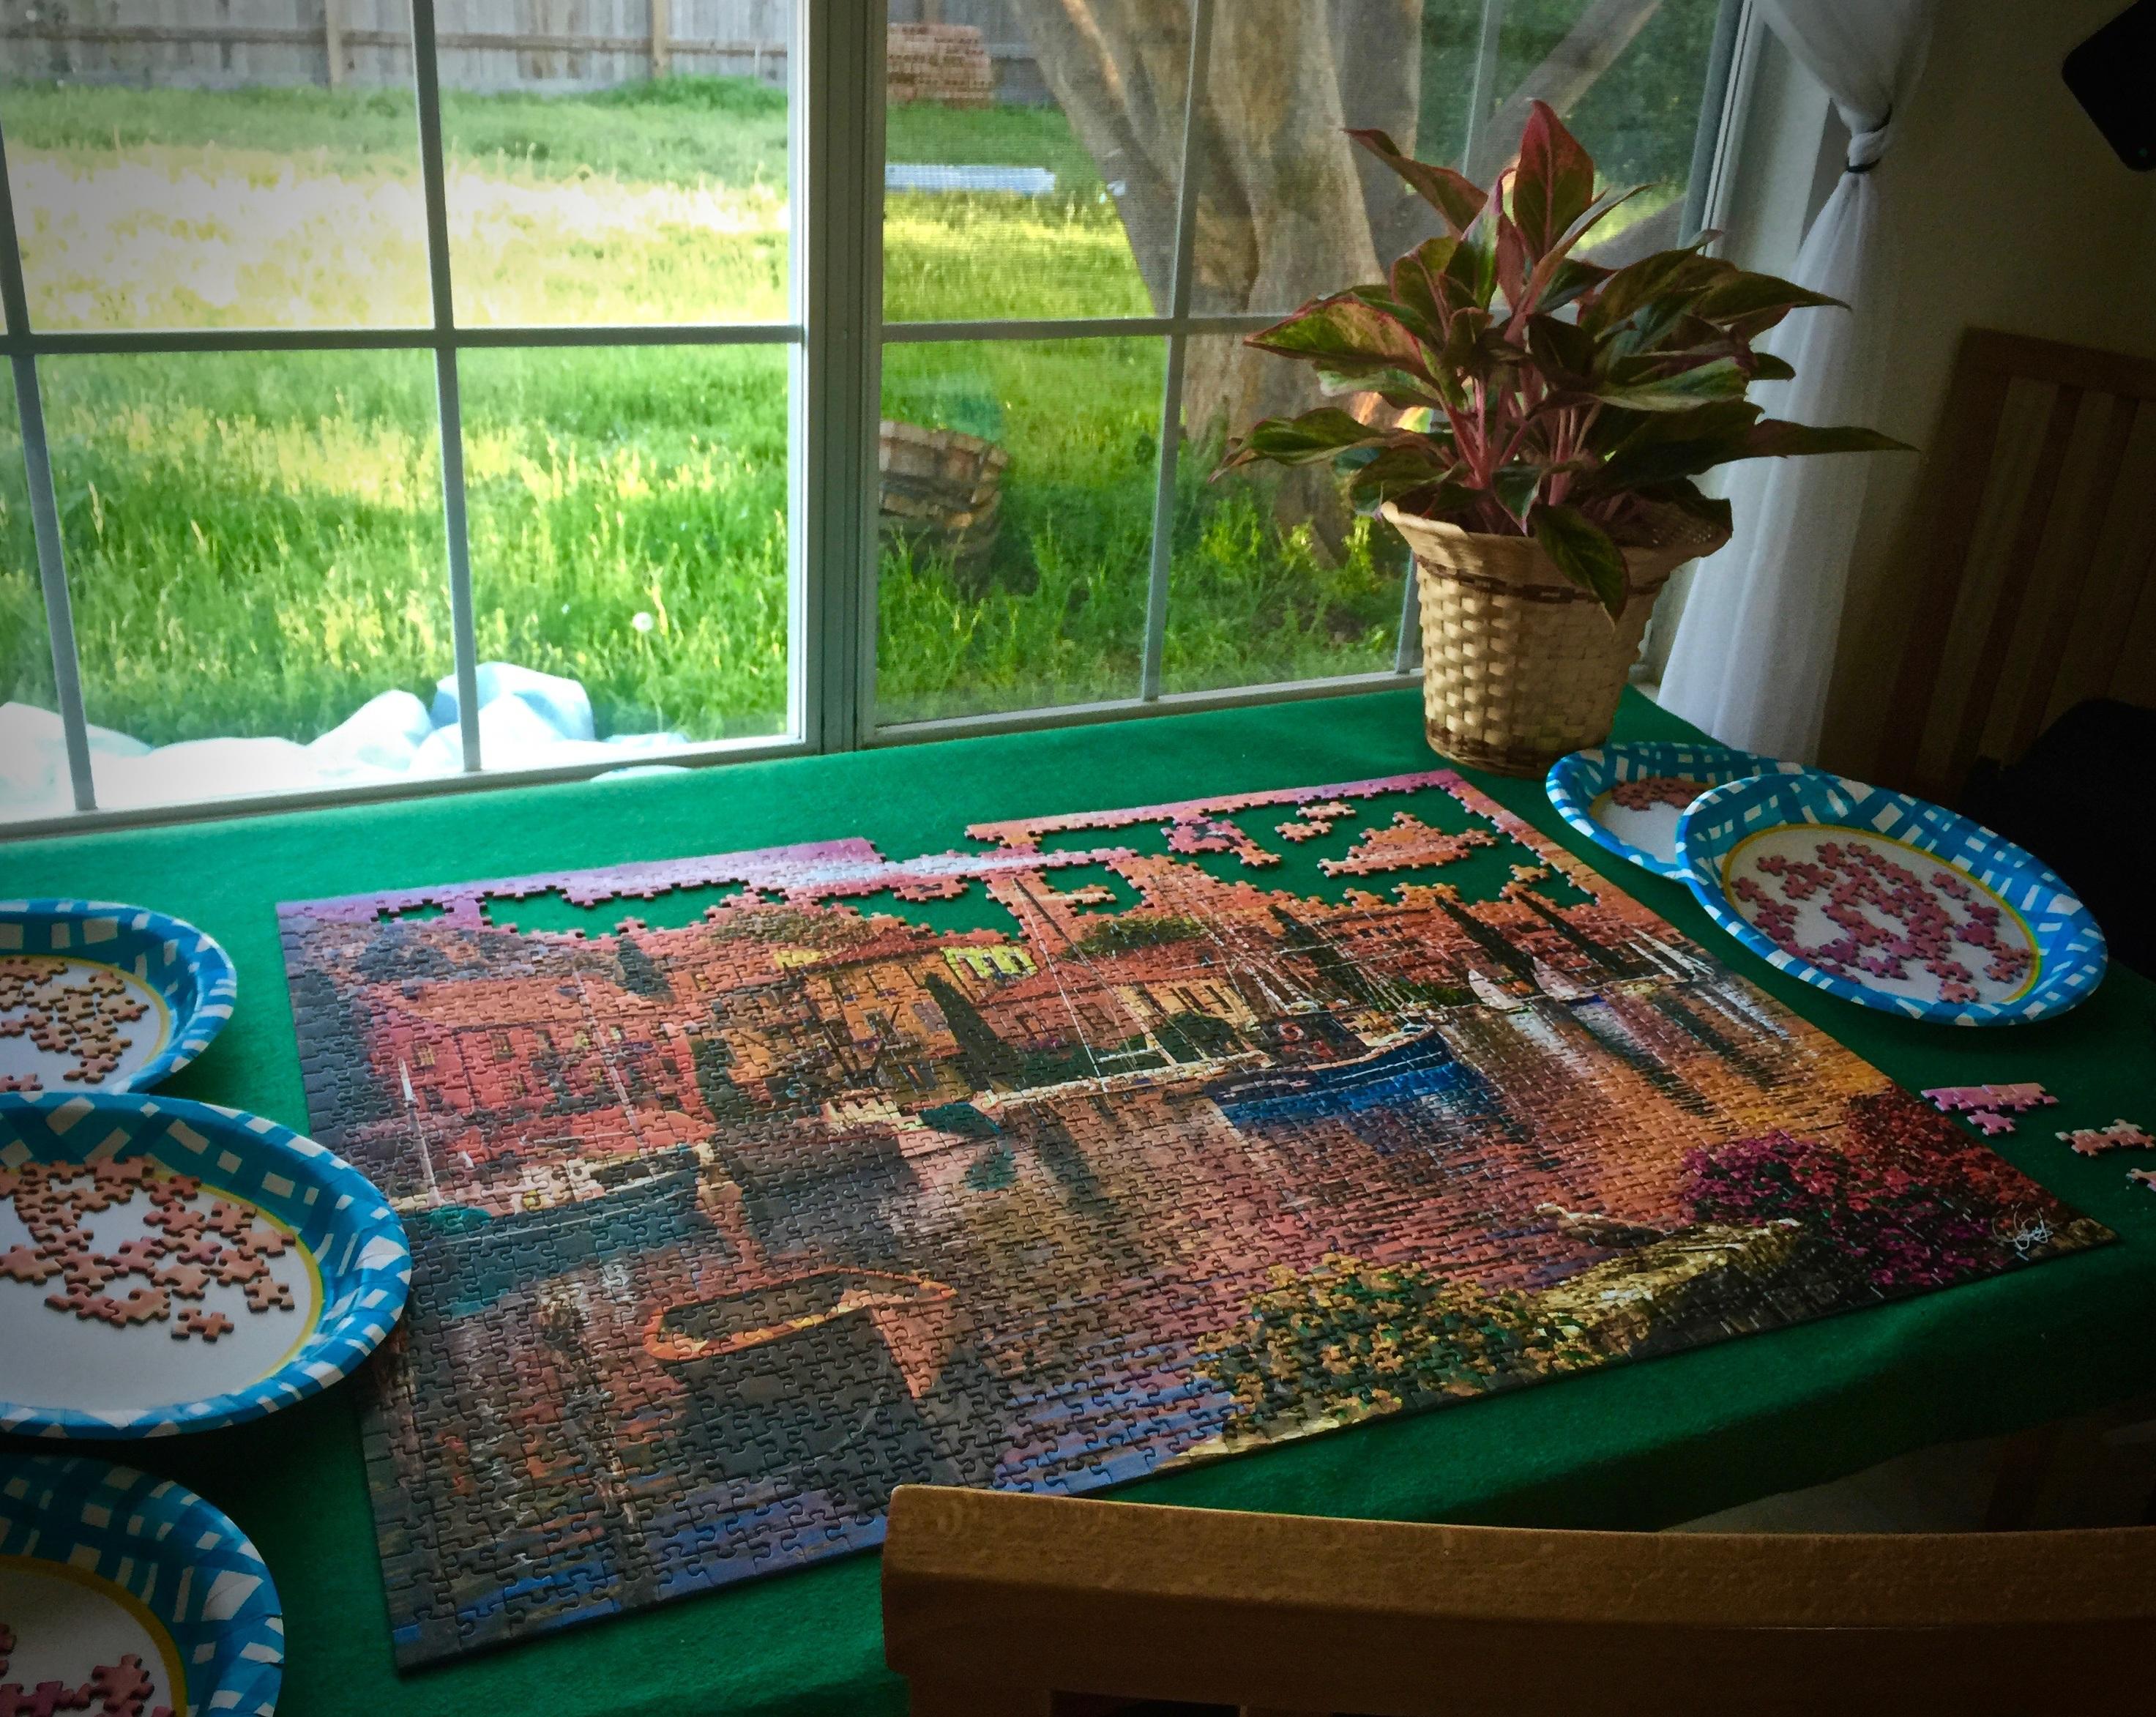 mesa flor ventana naranja verde azul plantas proceso planta de casa art relajacin diseo